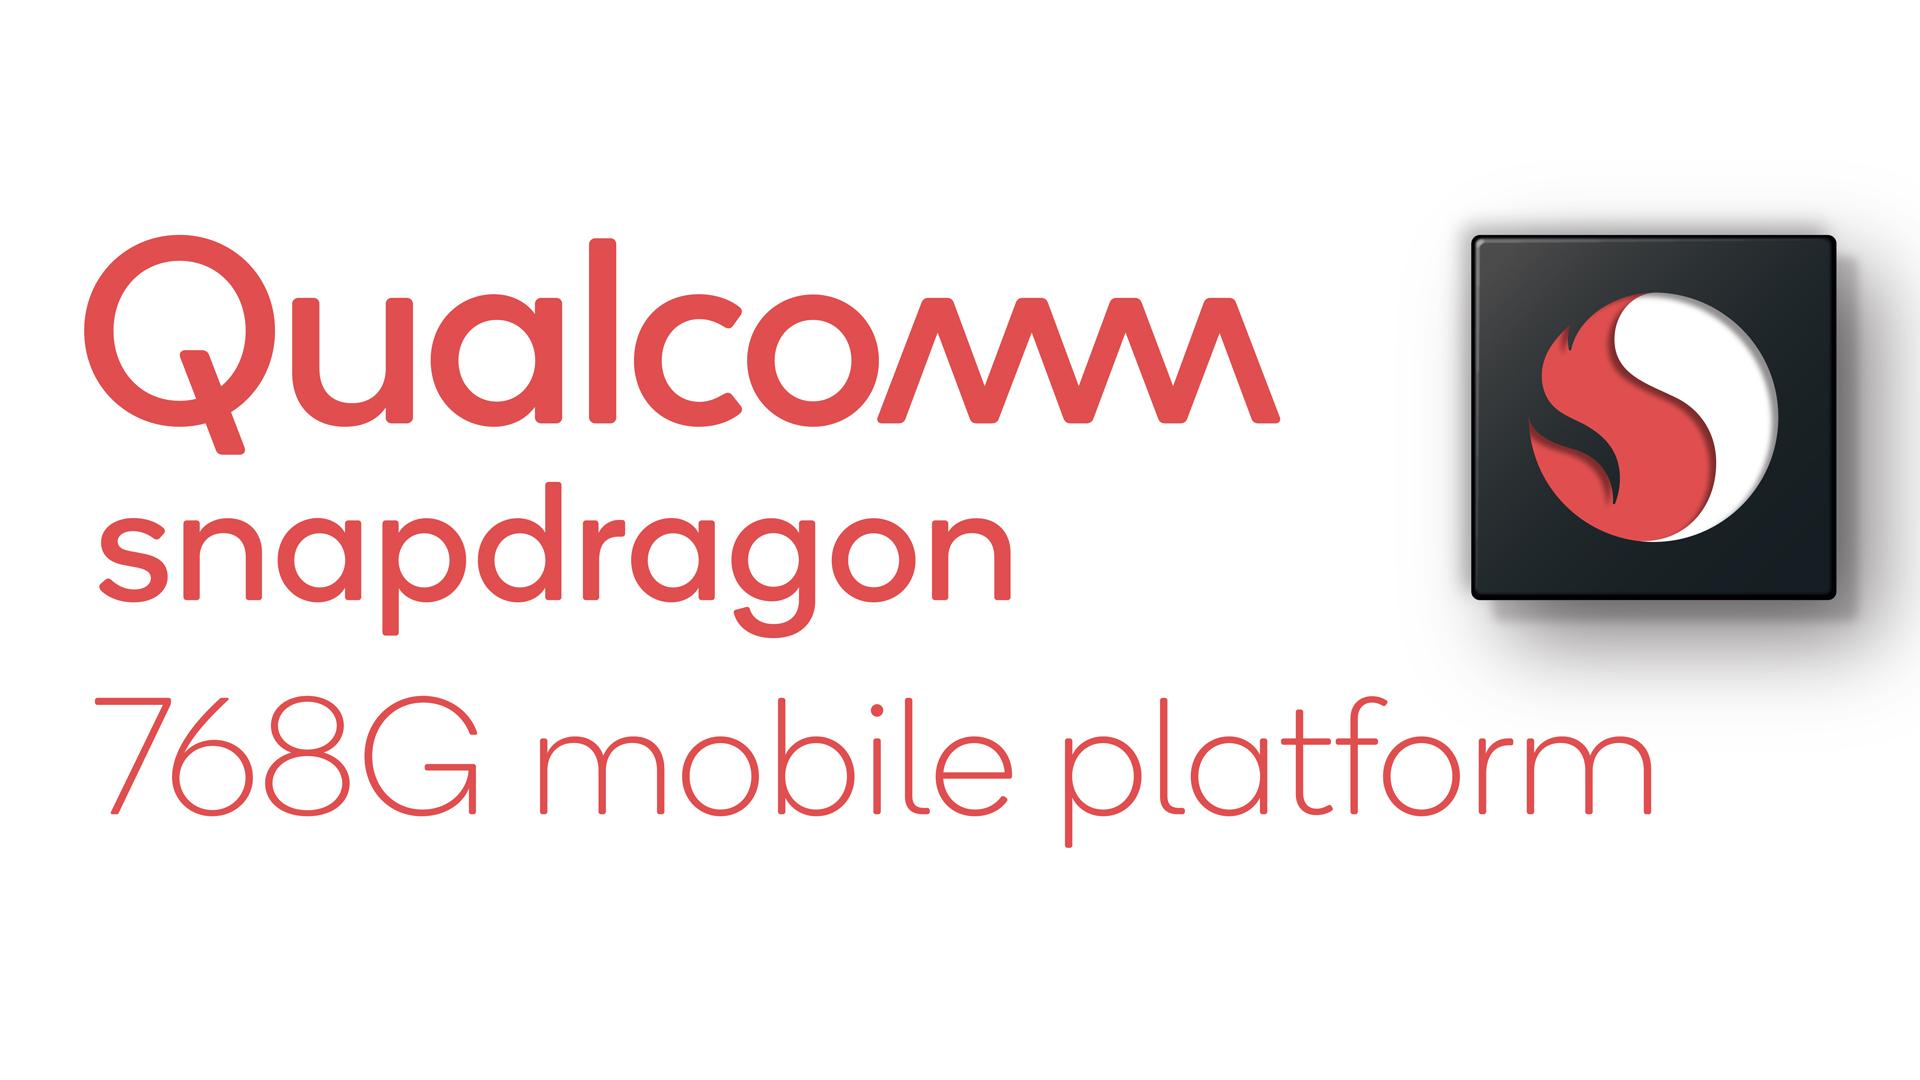 Qualcomm Snapdragon 768G logo